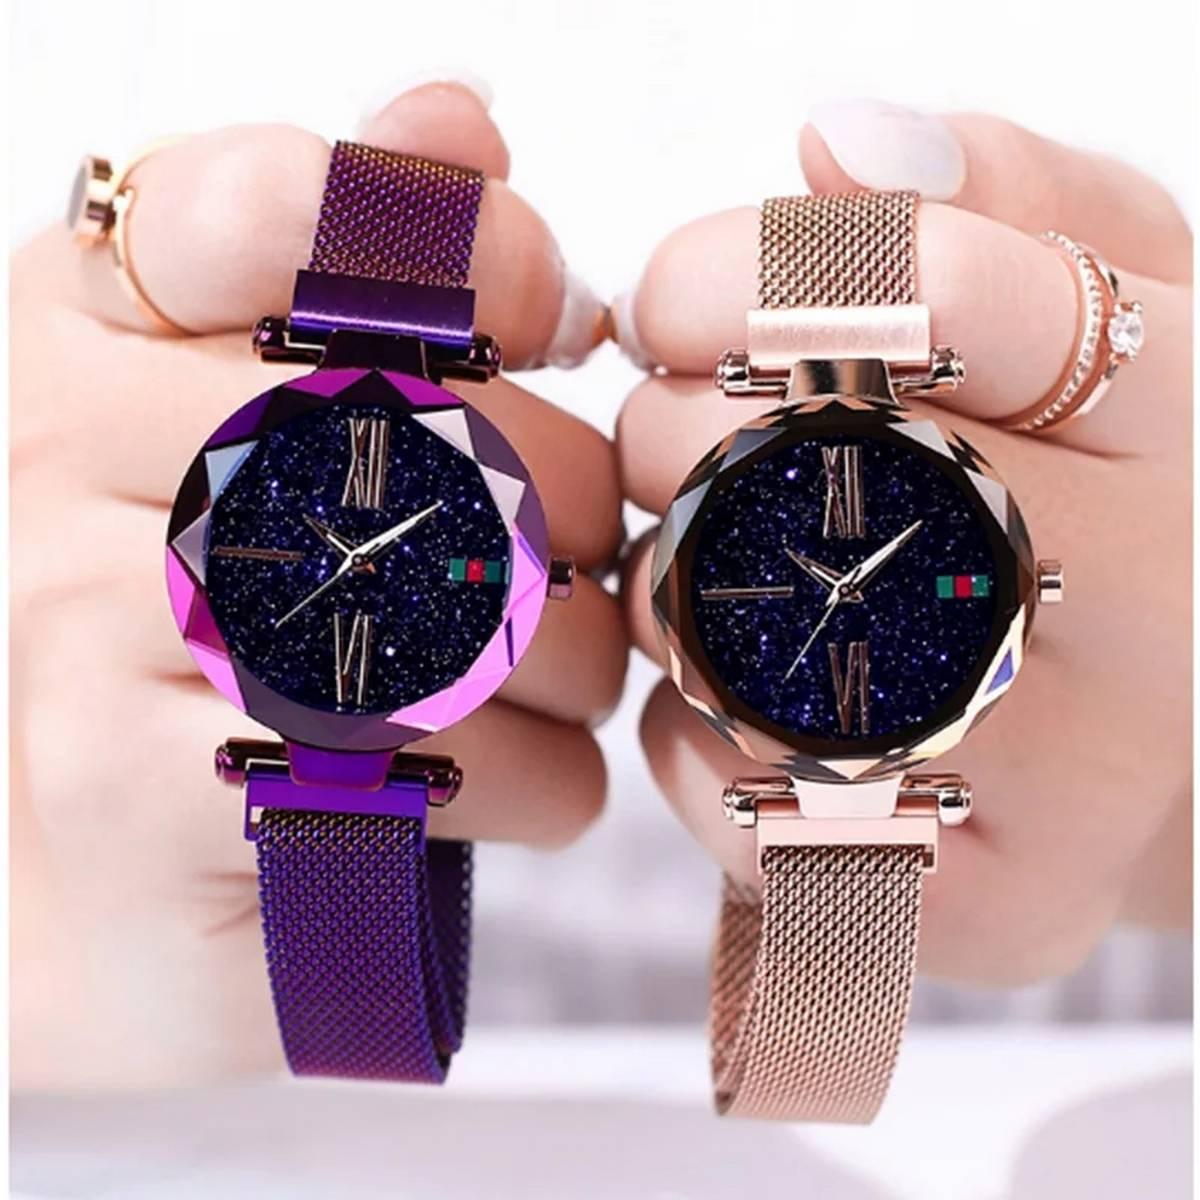 Luxury ladies watch magnet stainless steel mesh with starry fashion diamond female luminous shining quartz watch relogio feminin